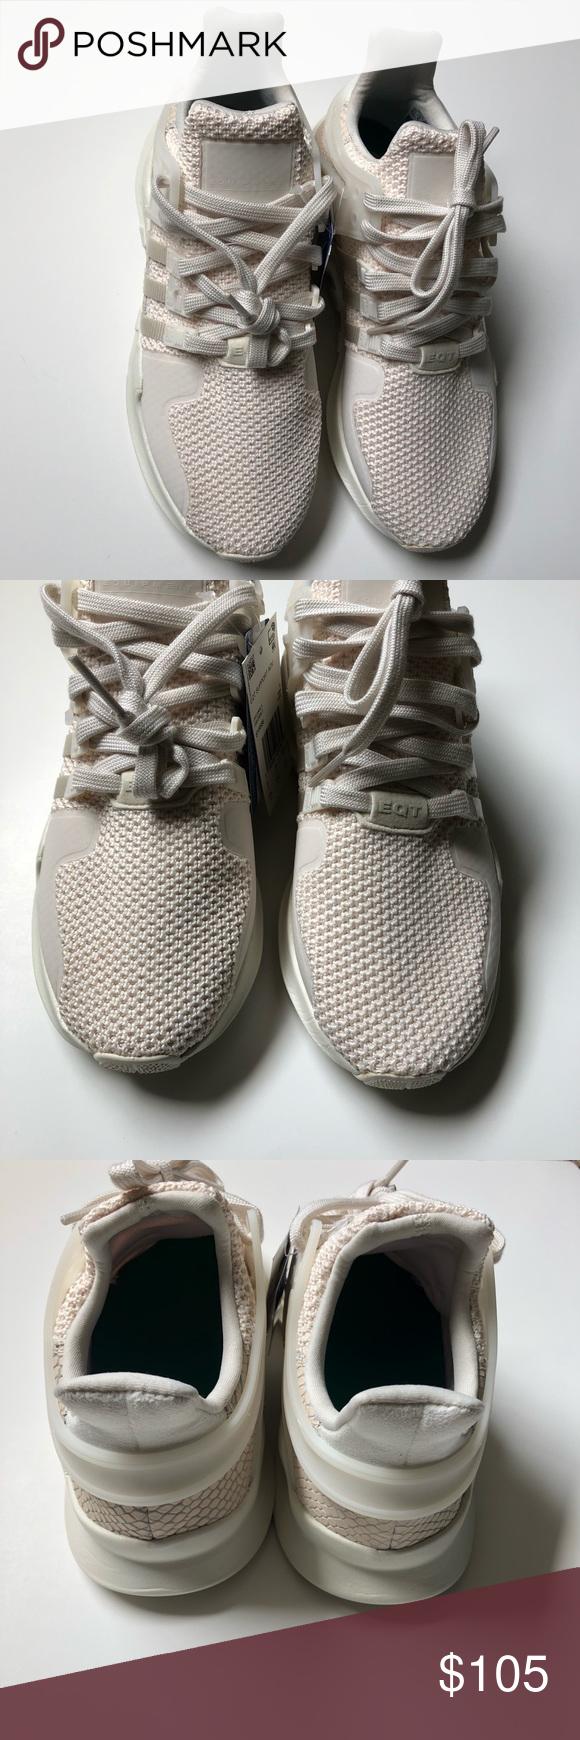 on sale ed328 4832e EQT SUPPORT ADV BY9586 Adidas originals EQT SUPPORT ADV Chalk White off  White mens running shoes